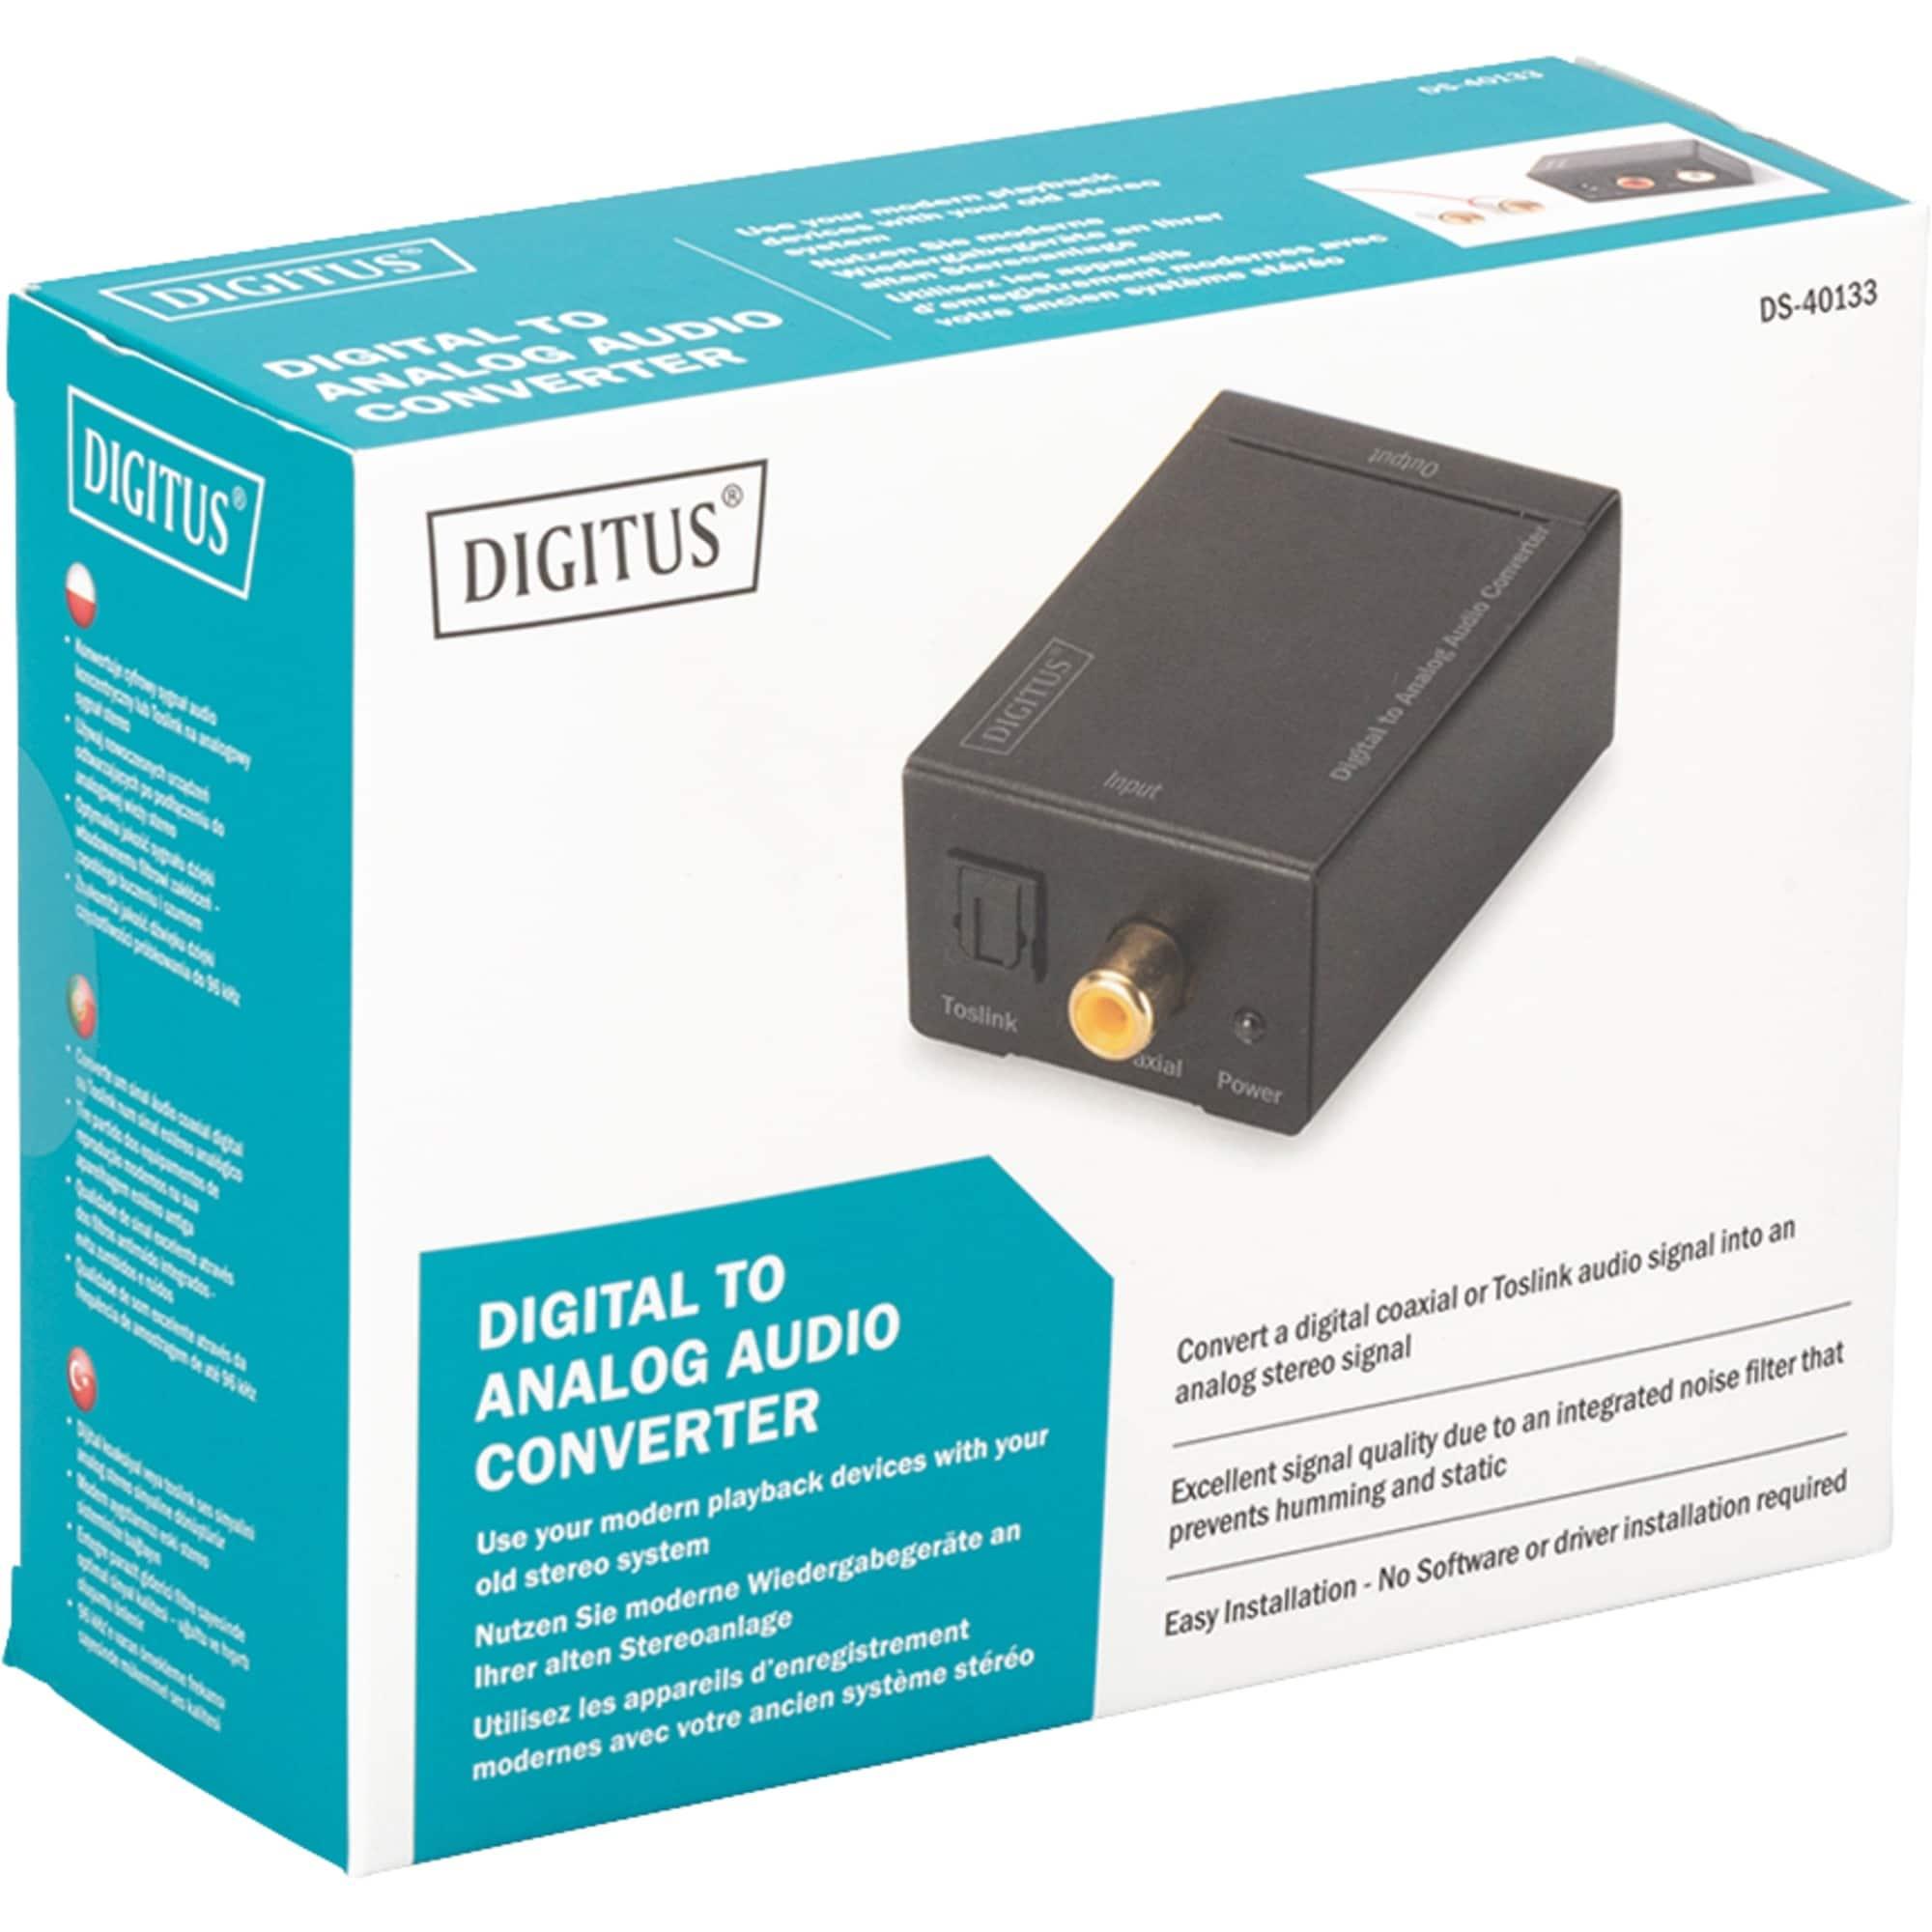 Digitus Konverter Digital zu Analog Konverter DS-40133